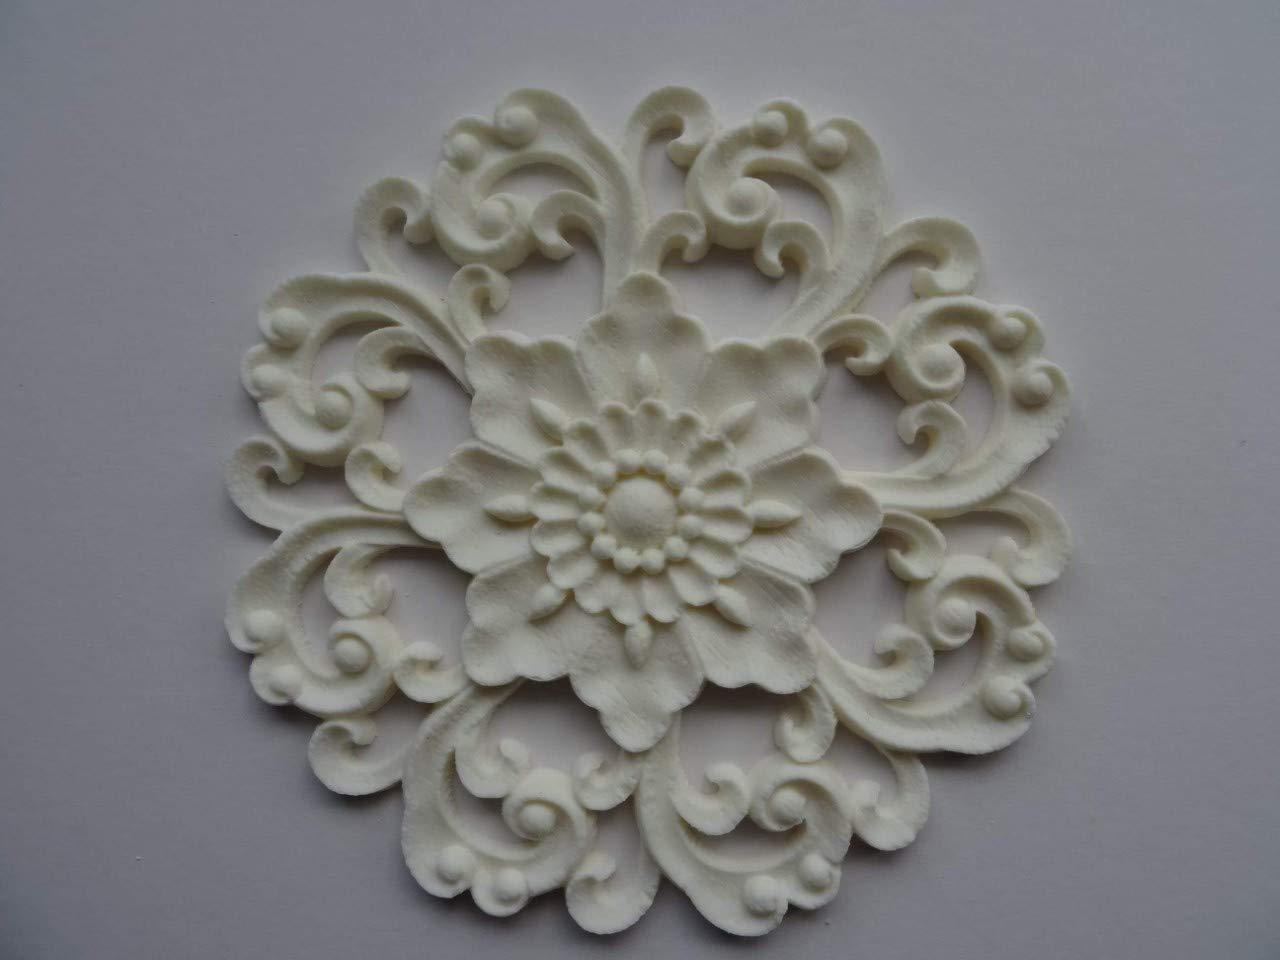 Decorative baroque center x 2 applique onlay resin furniture moulding bcx2